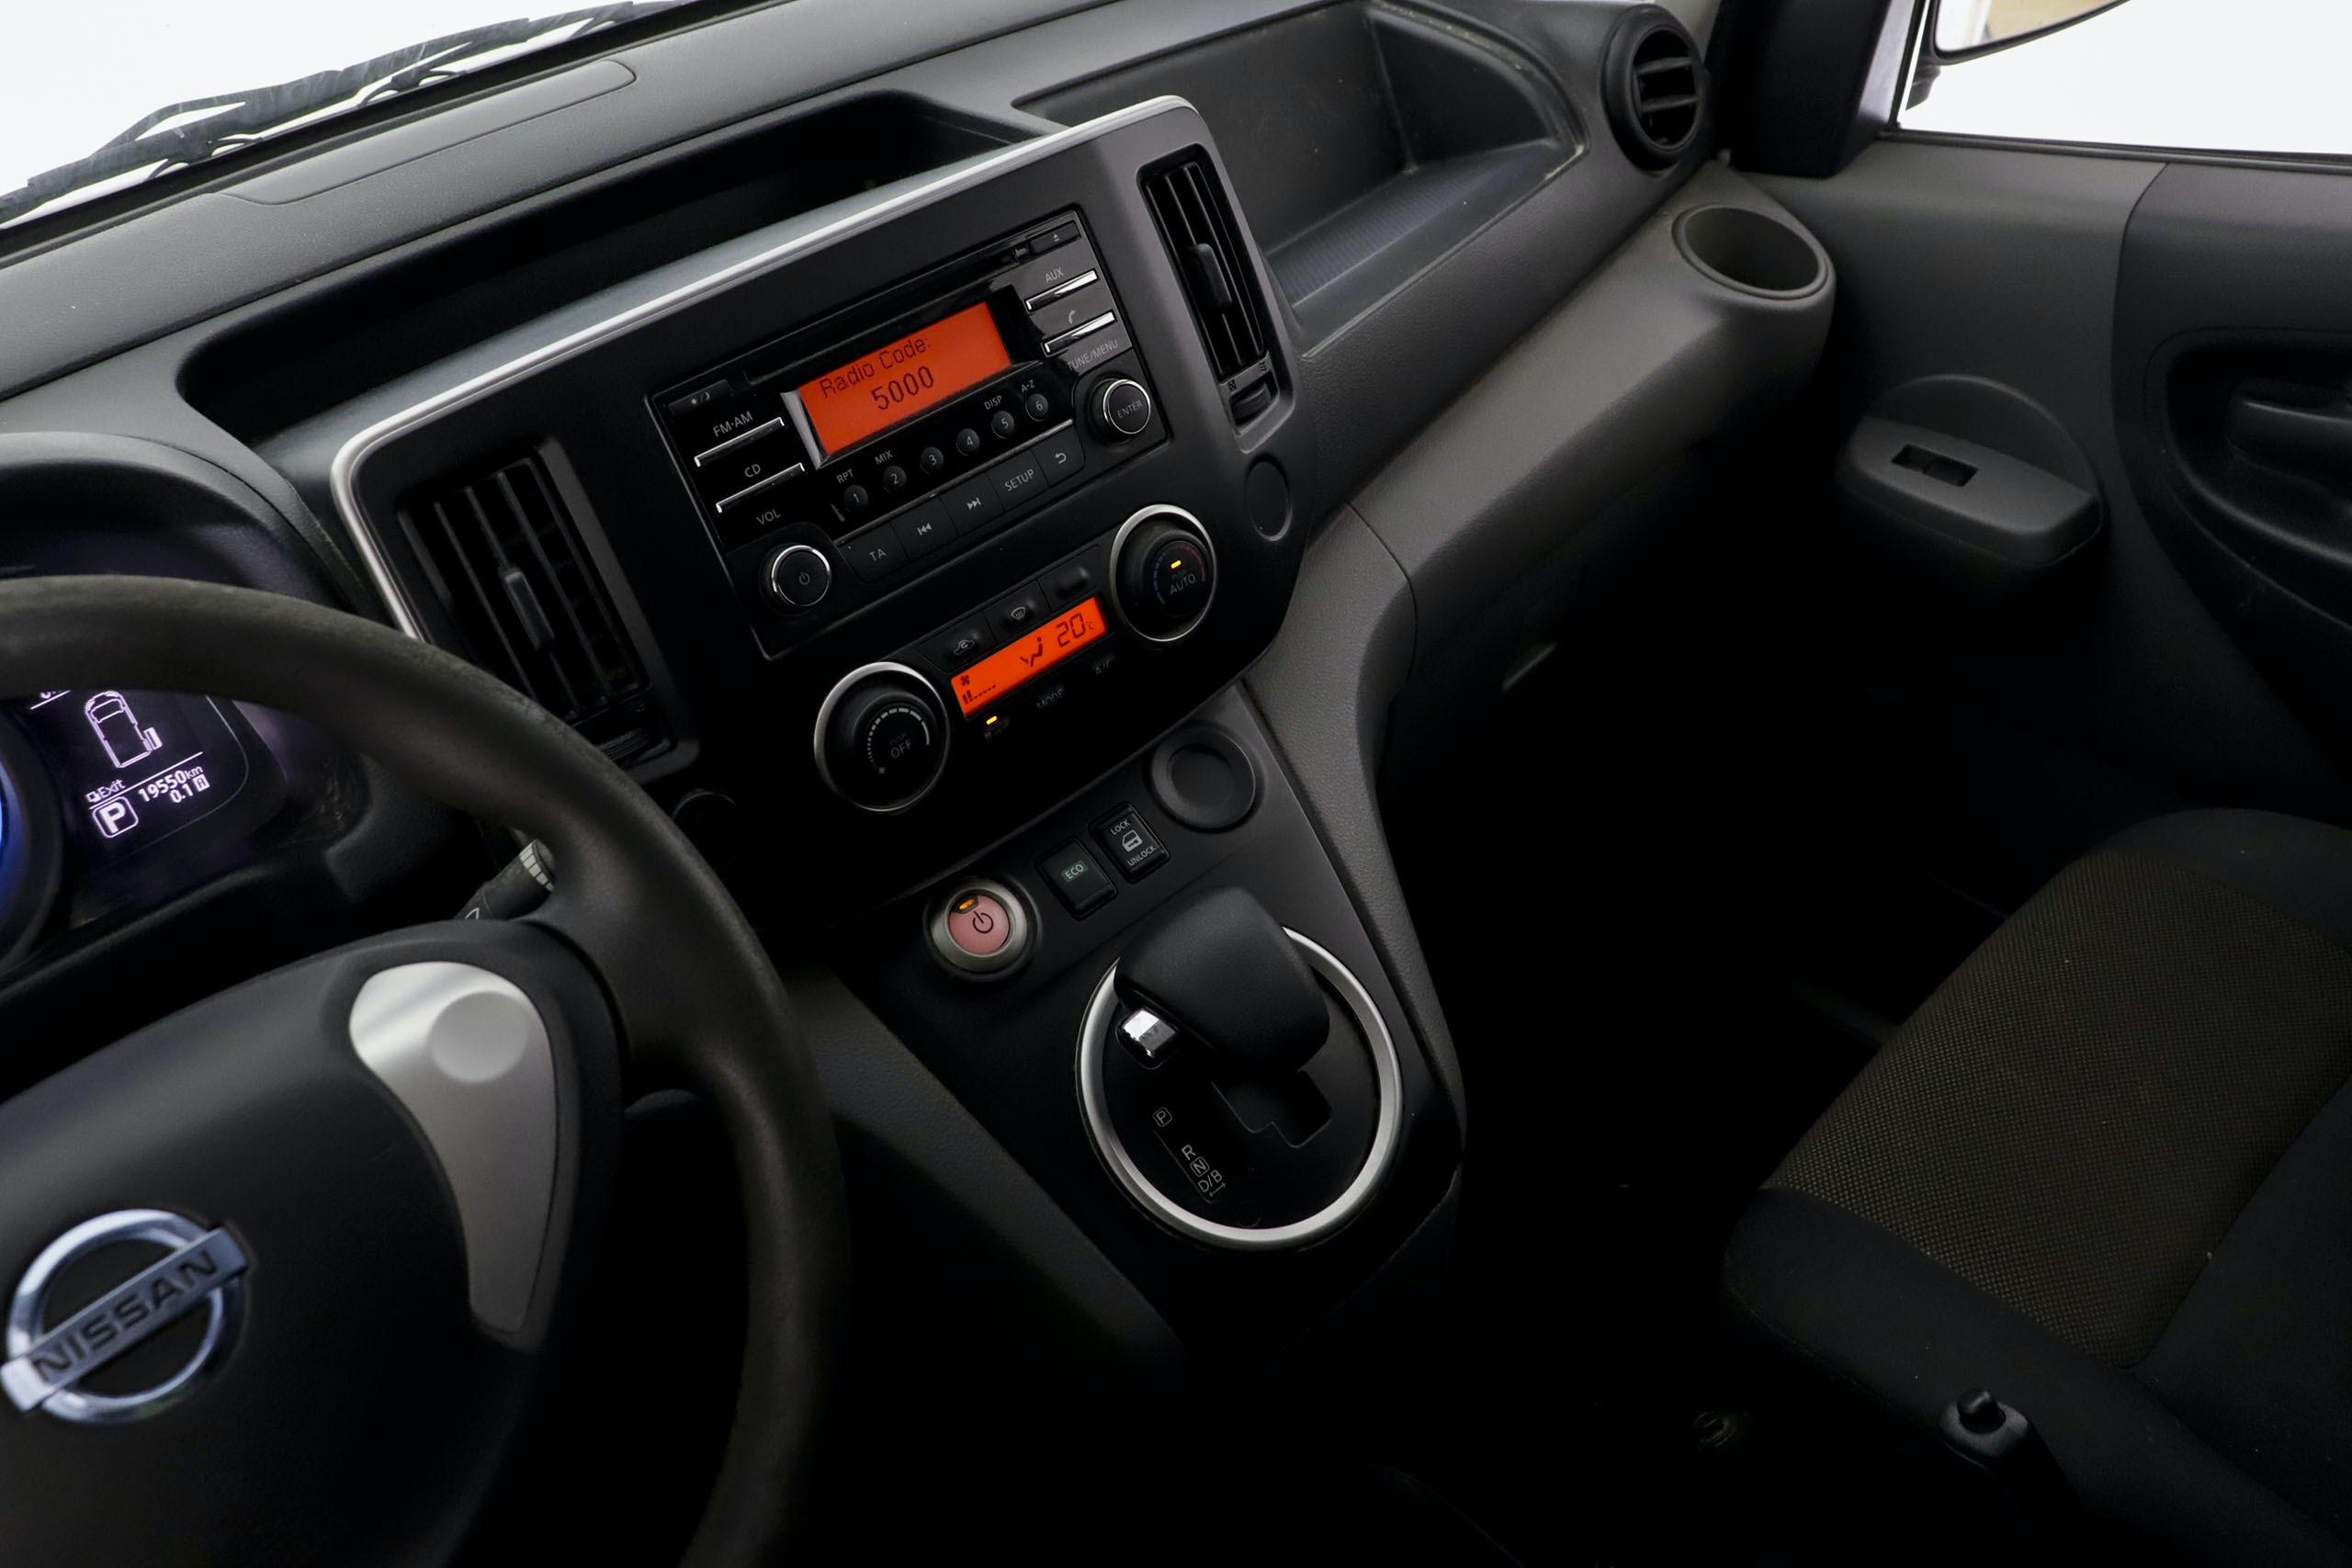 Nissan E-nv200 Combi5 110cv 5p Hybrid E5 Auto - Foto 22